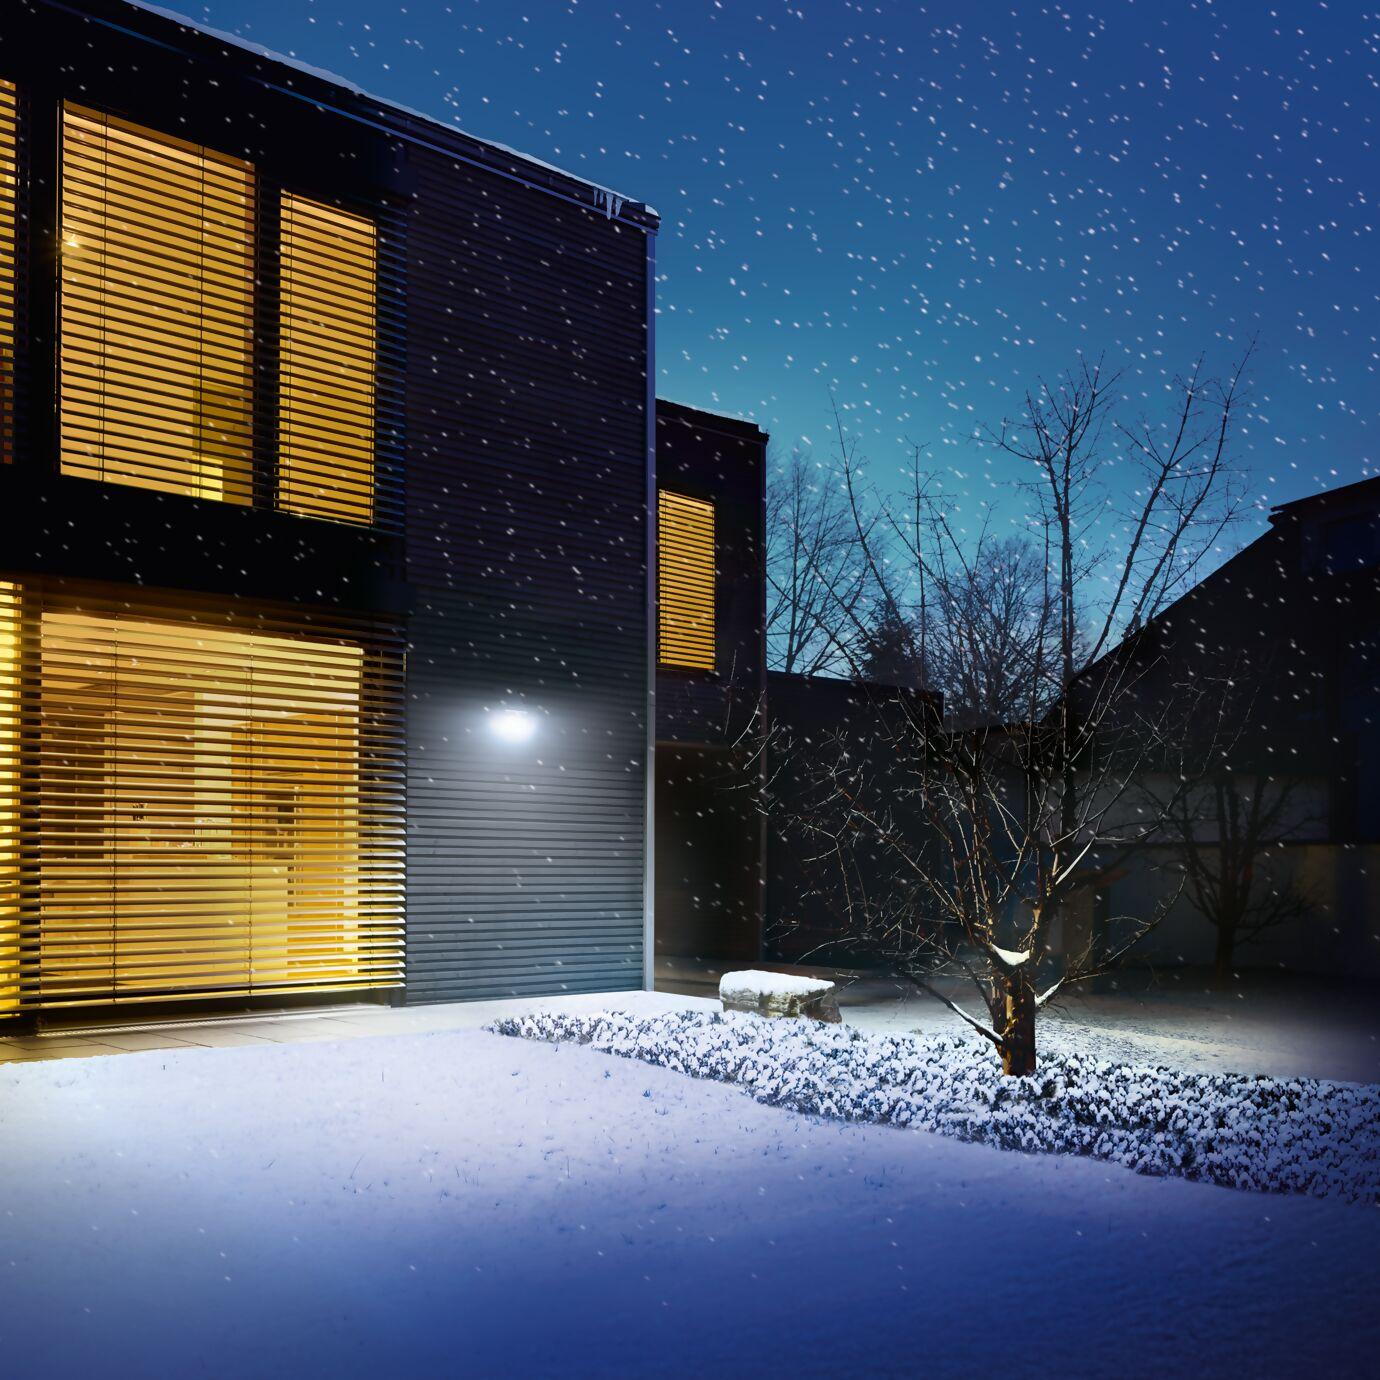 Solarbeleuchtung im Winter am Haus